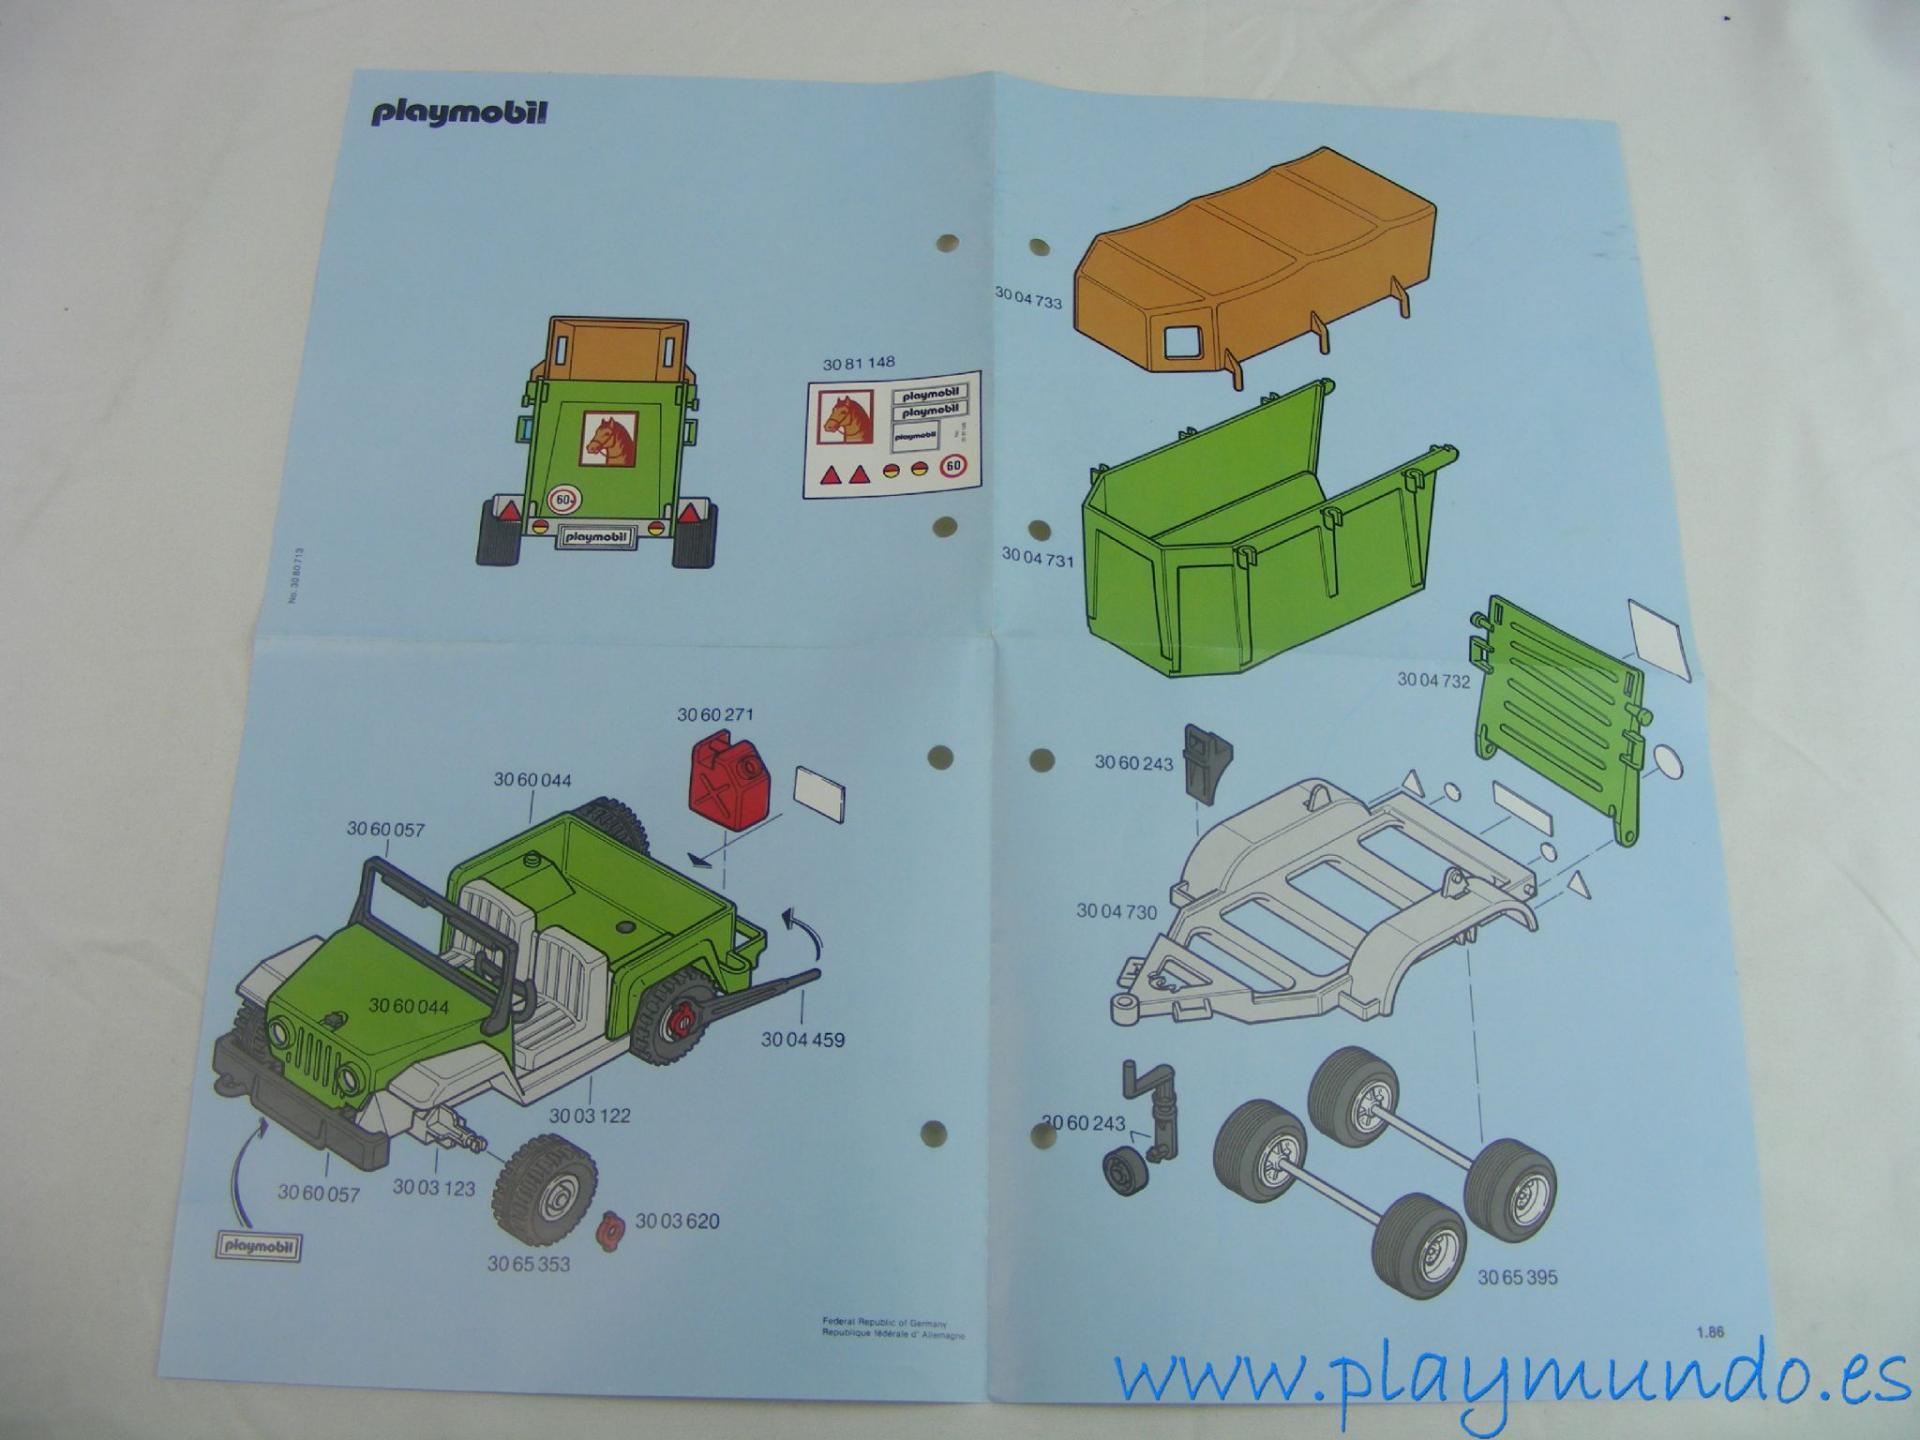 PLAYMOBIL MANUAL CONJUNTO HIPICA REF. 3140